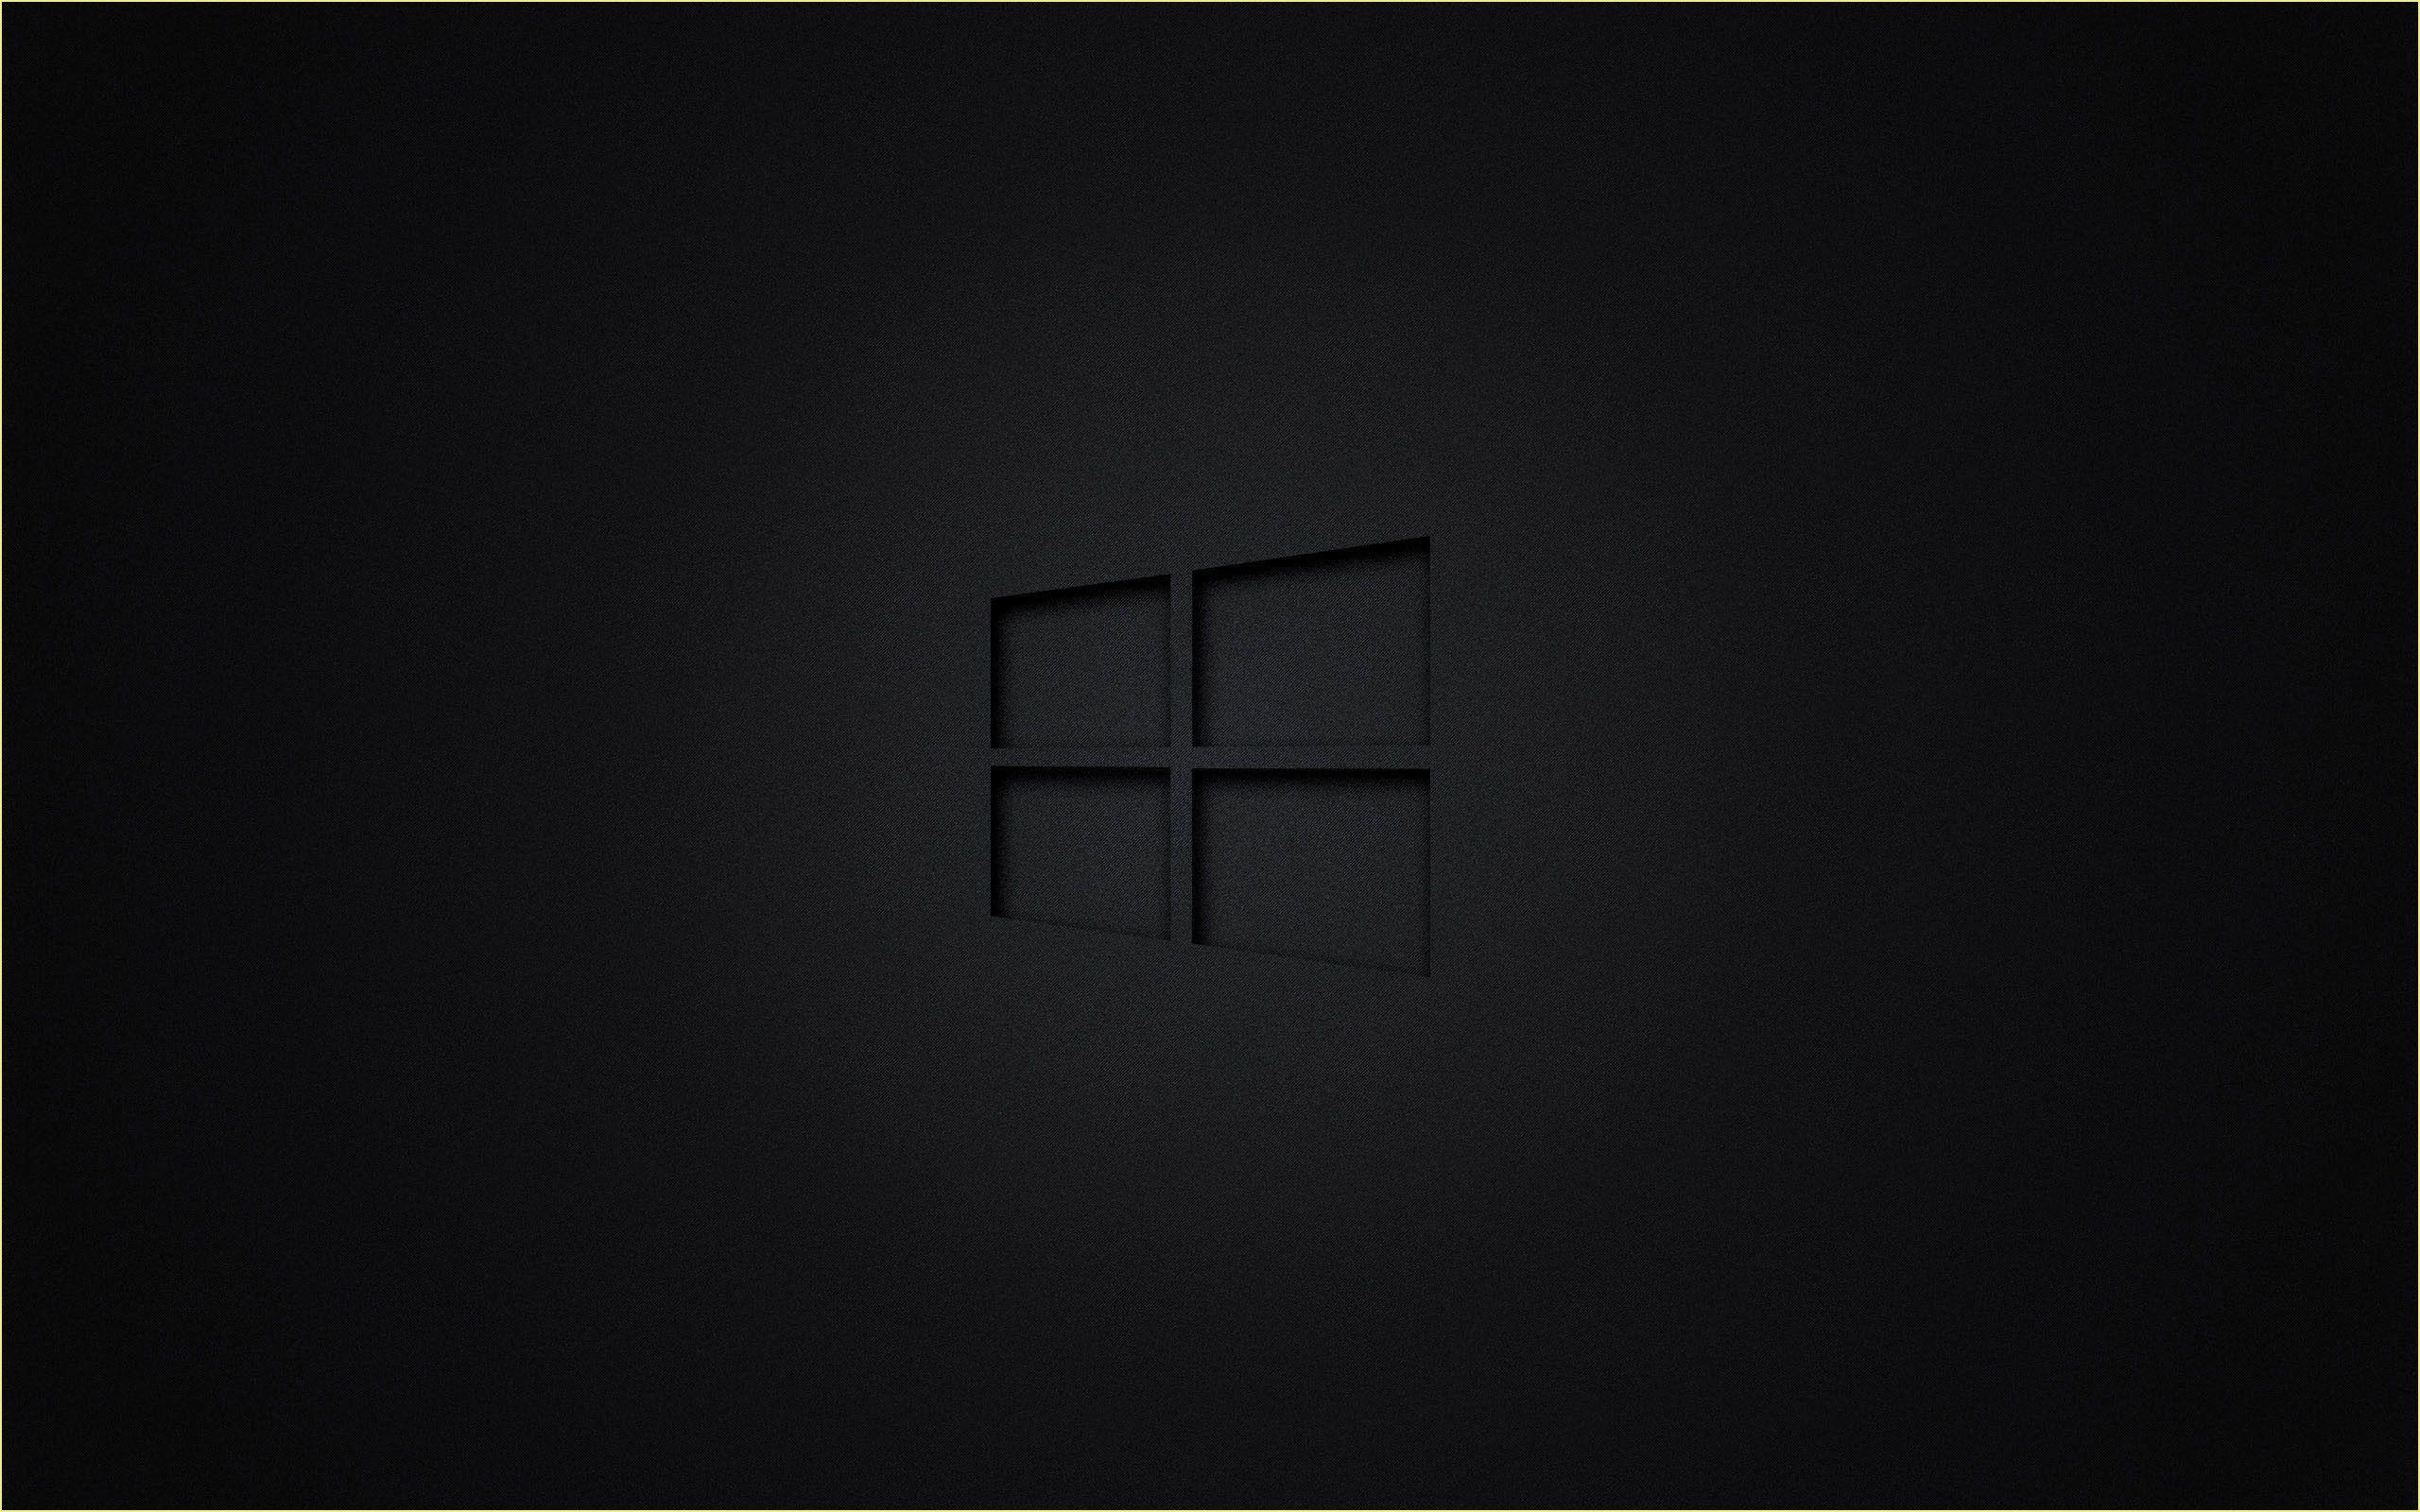 Windows Hintergrundbilder 4k 2020 Wallpaper Windows 10 Desktop Wallpaper Black Hd Dark Wallpapers